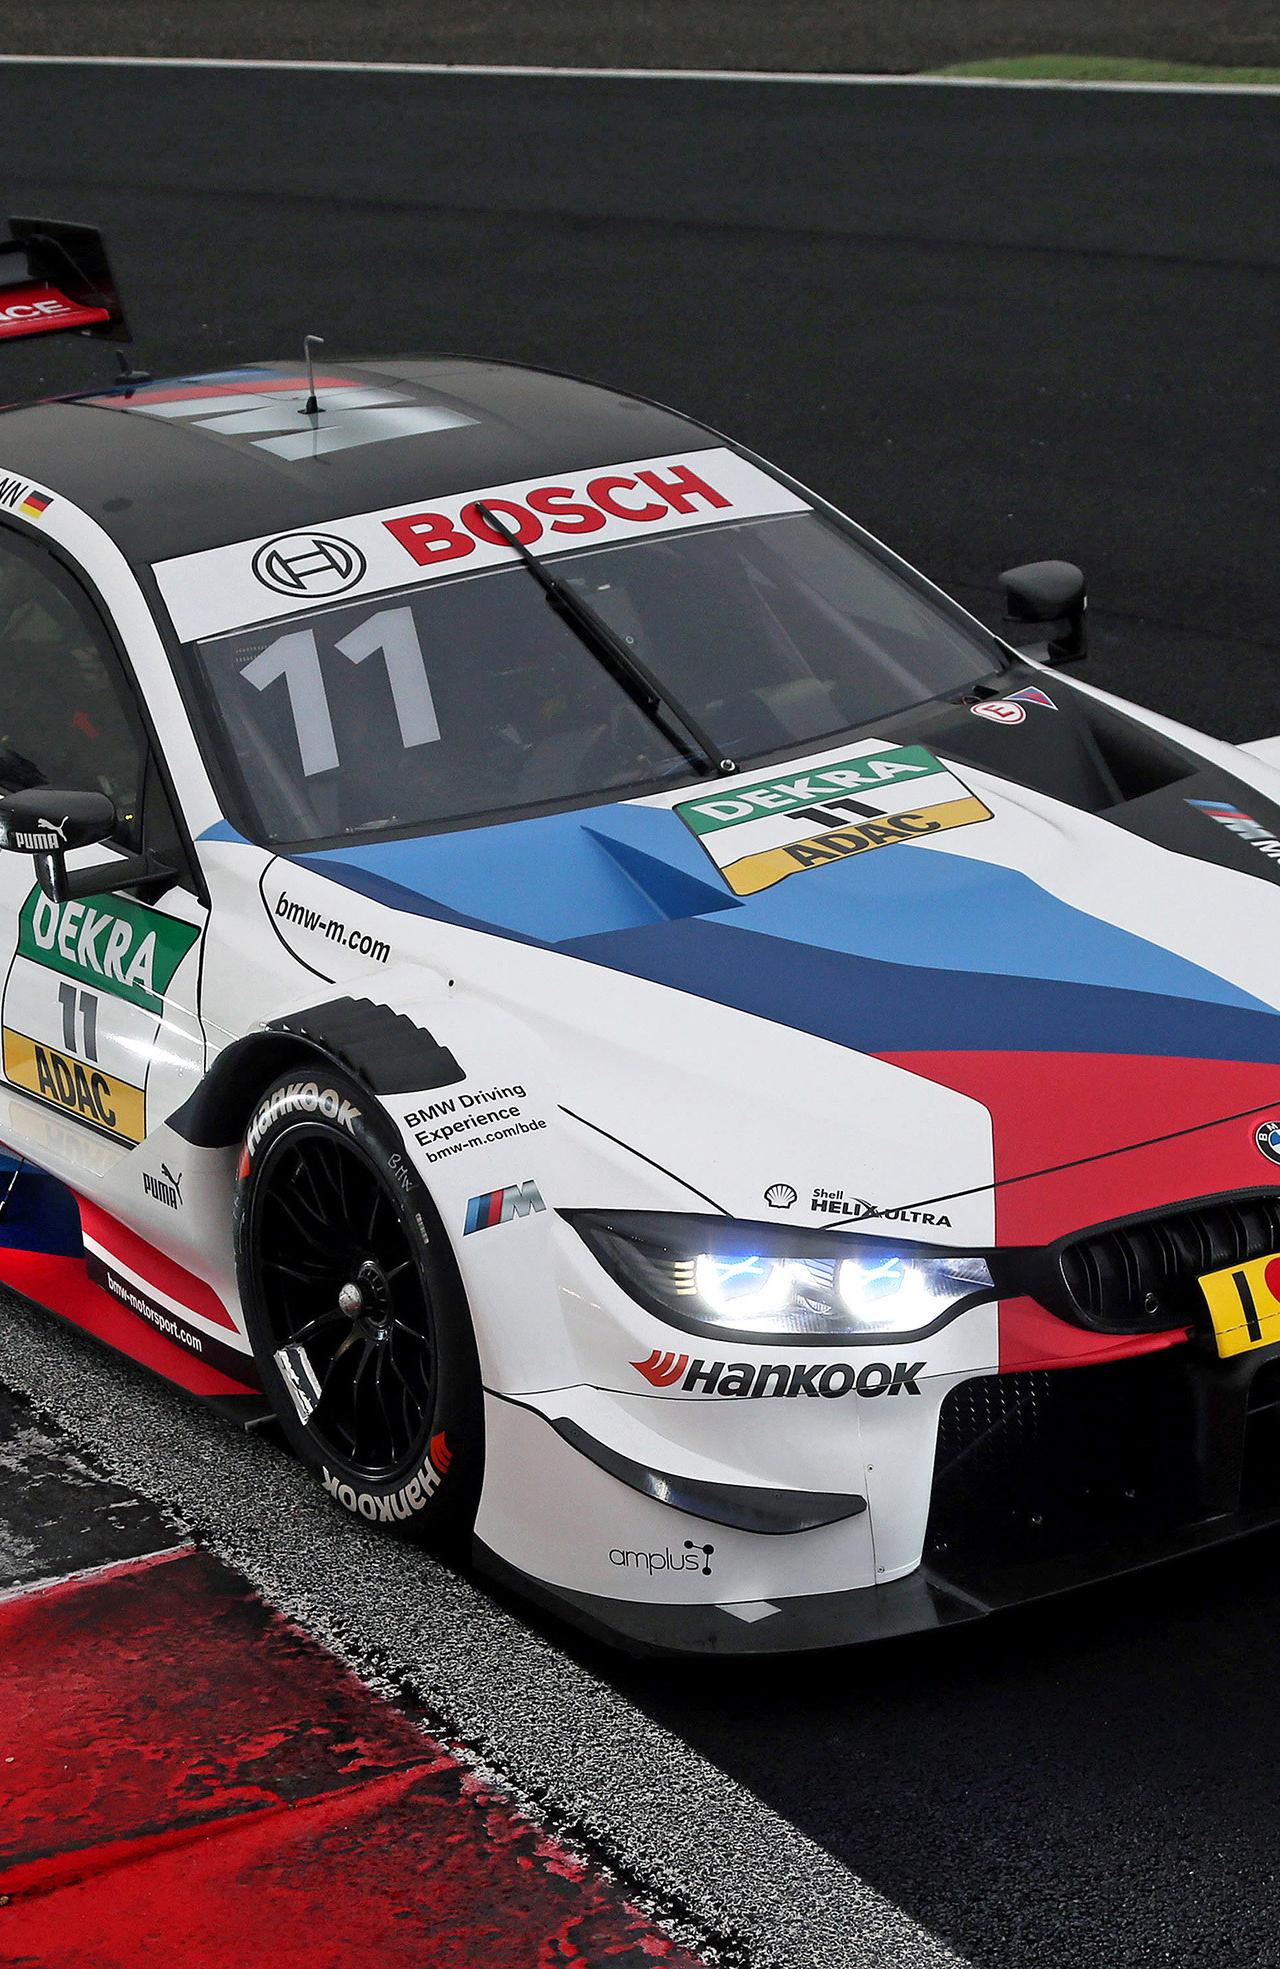 Download 1280x2120 Wallpaper Bmw M4 Dtm 2018 Racing Car